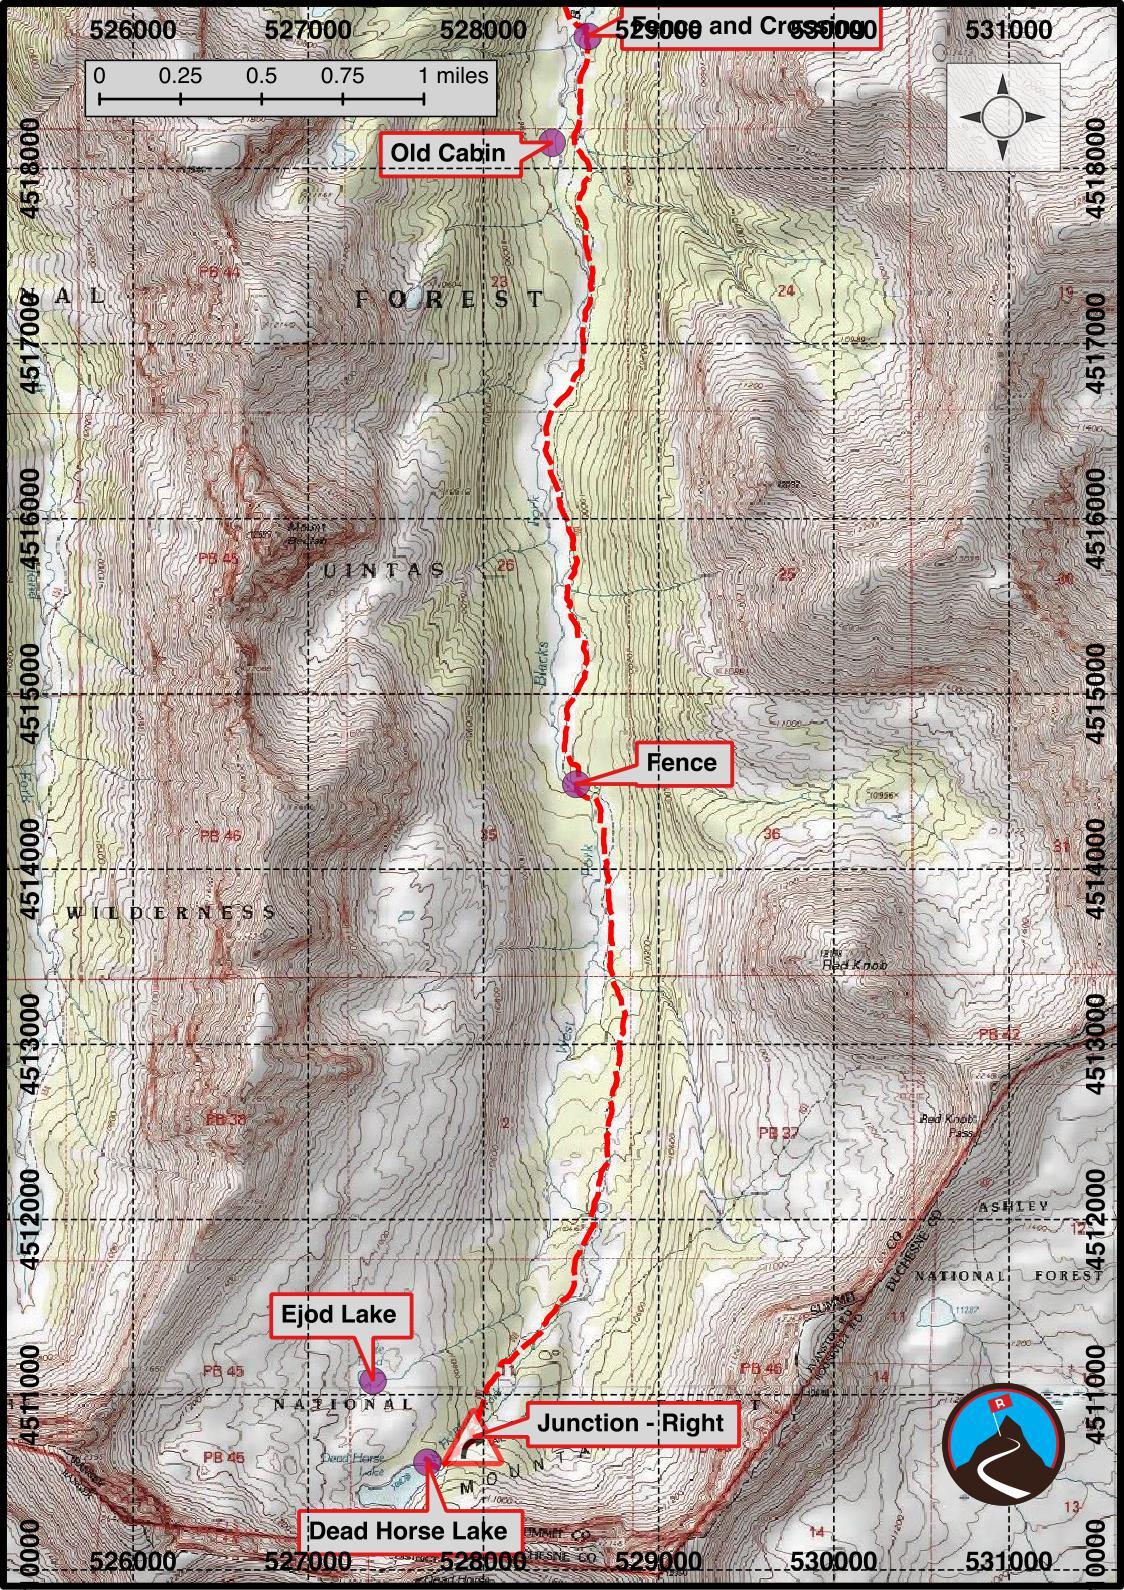 Hiking Dead Horse Lake - Uinta Mountains - Road Trip Ryan